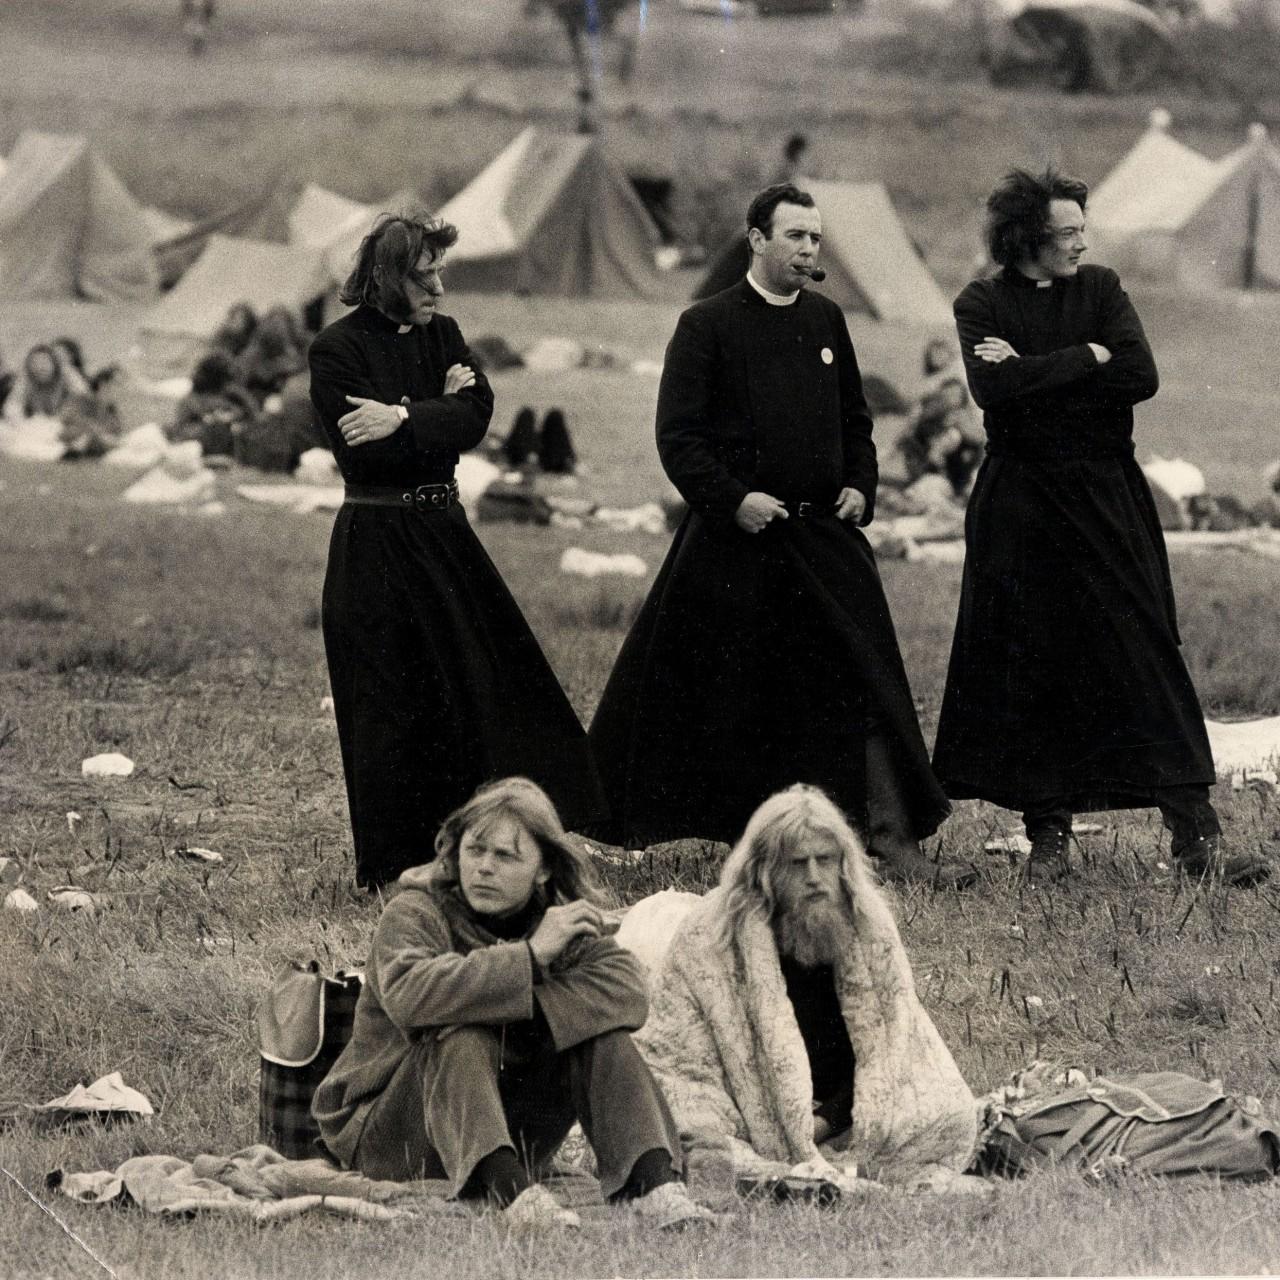 Священники и хиппи на фестивале в Гластонбери, 1971 год